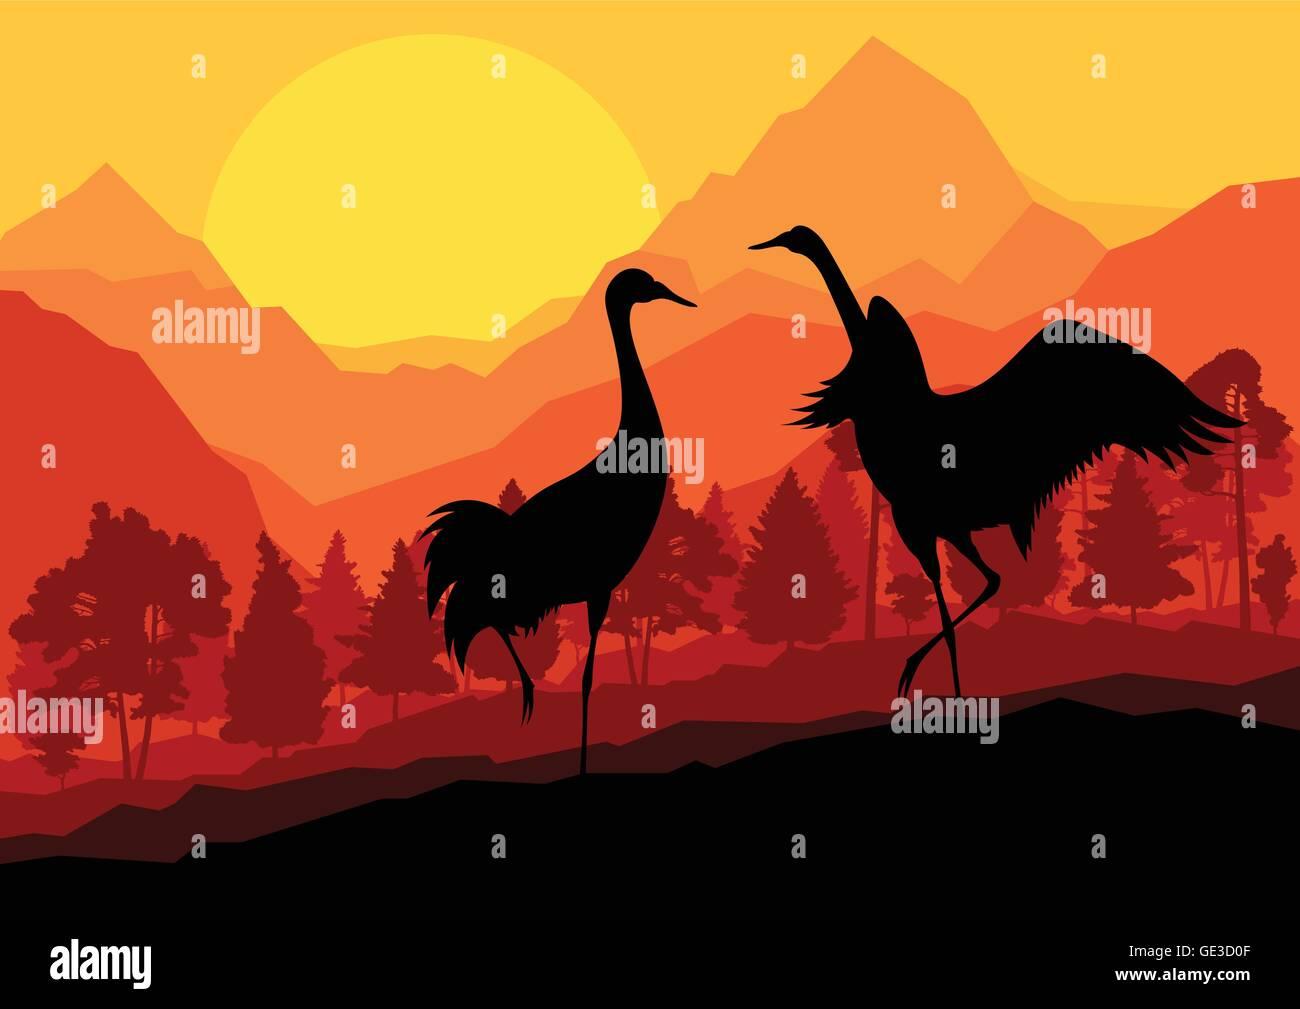 Crane couple in wild mountain nature landscape background illustration vector - Stock Vector